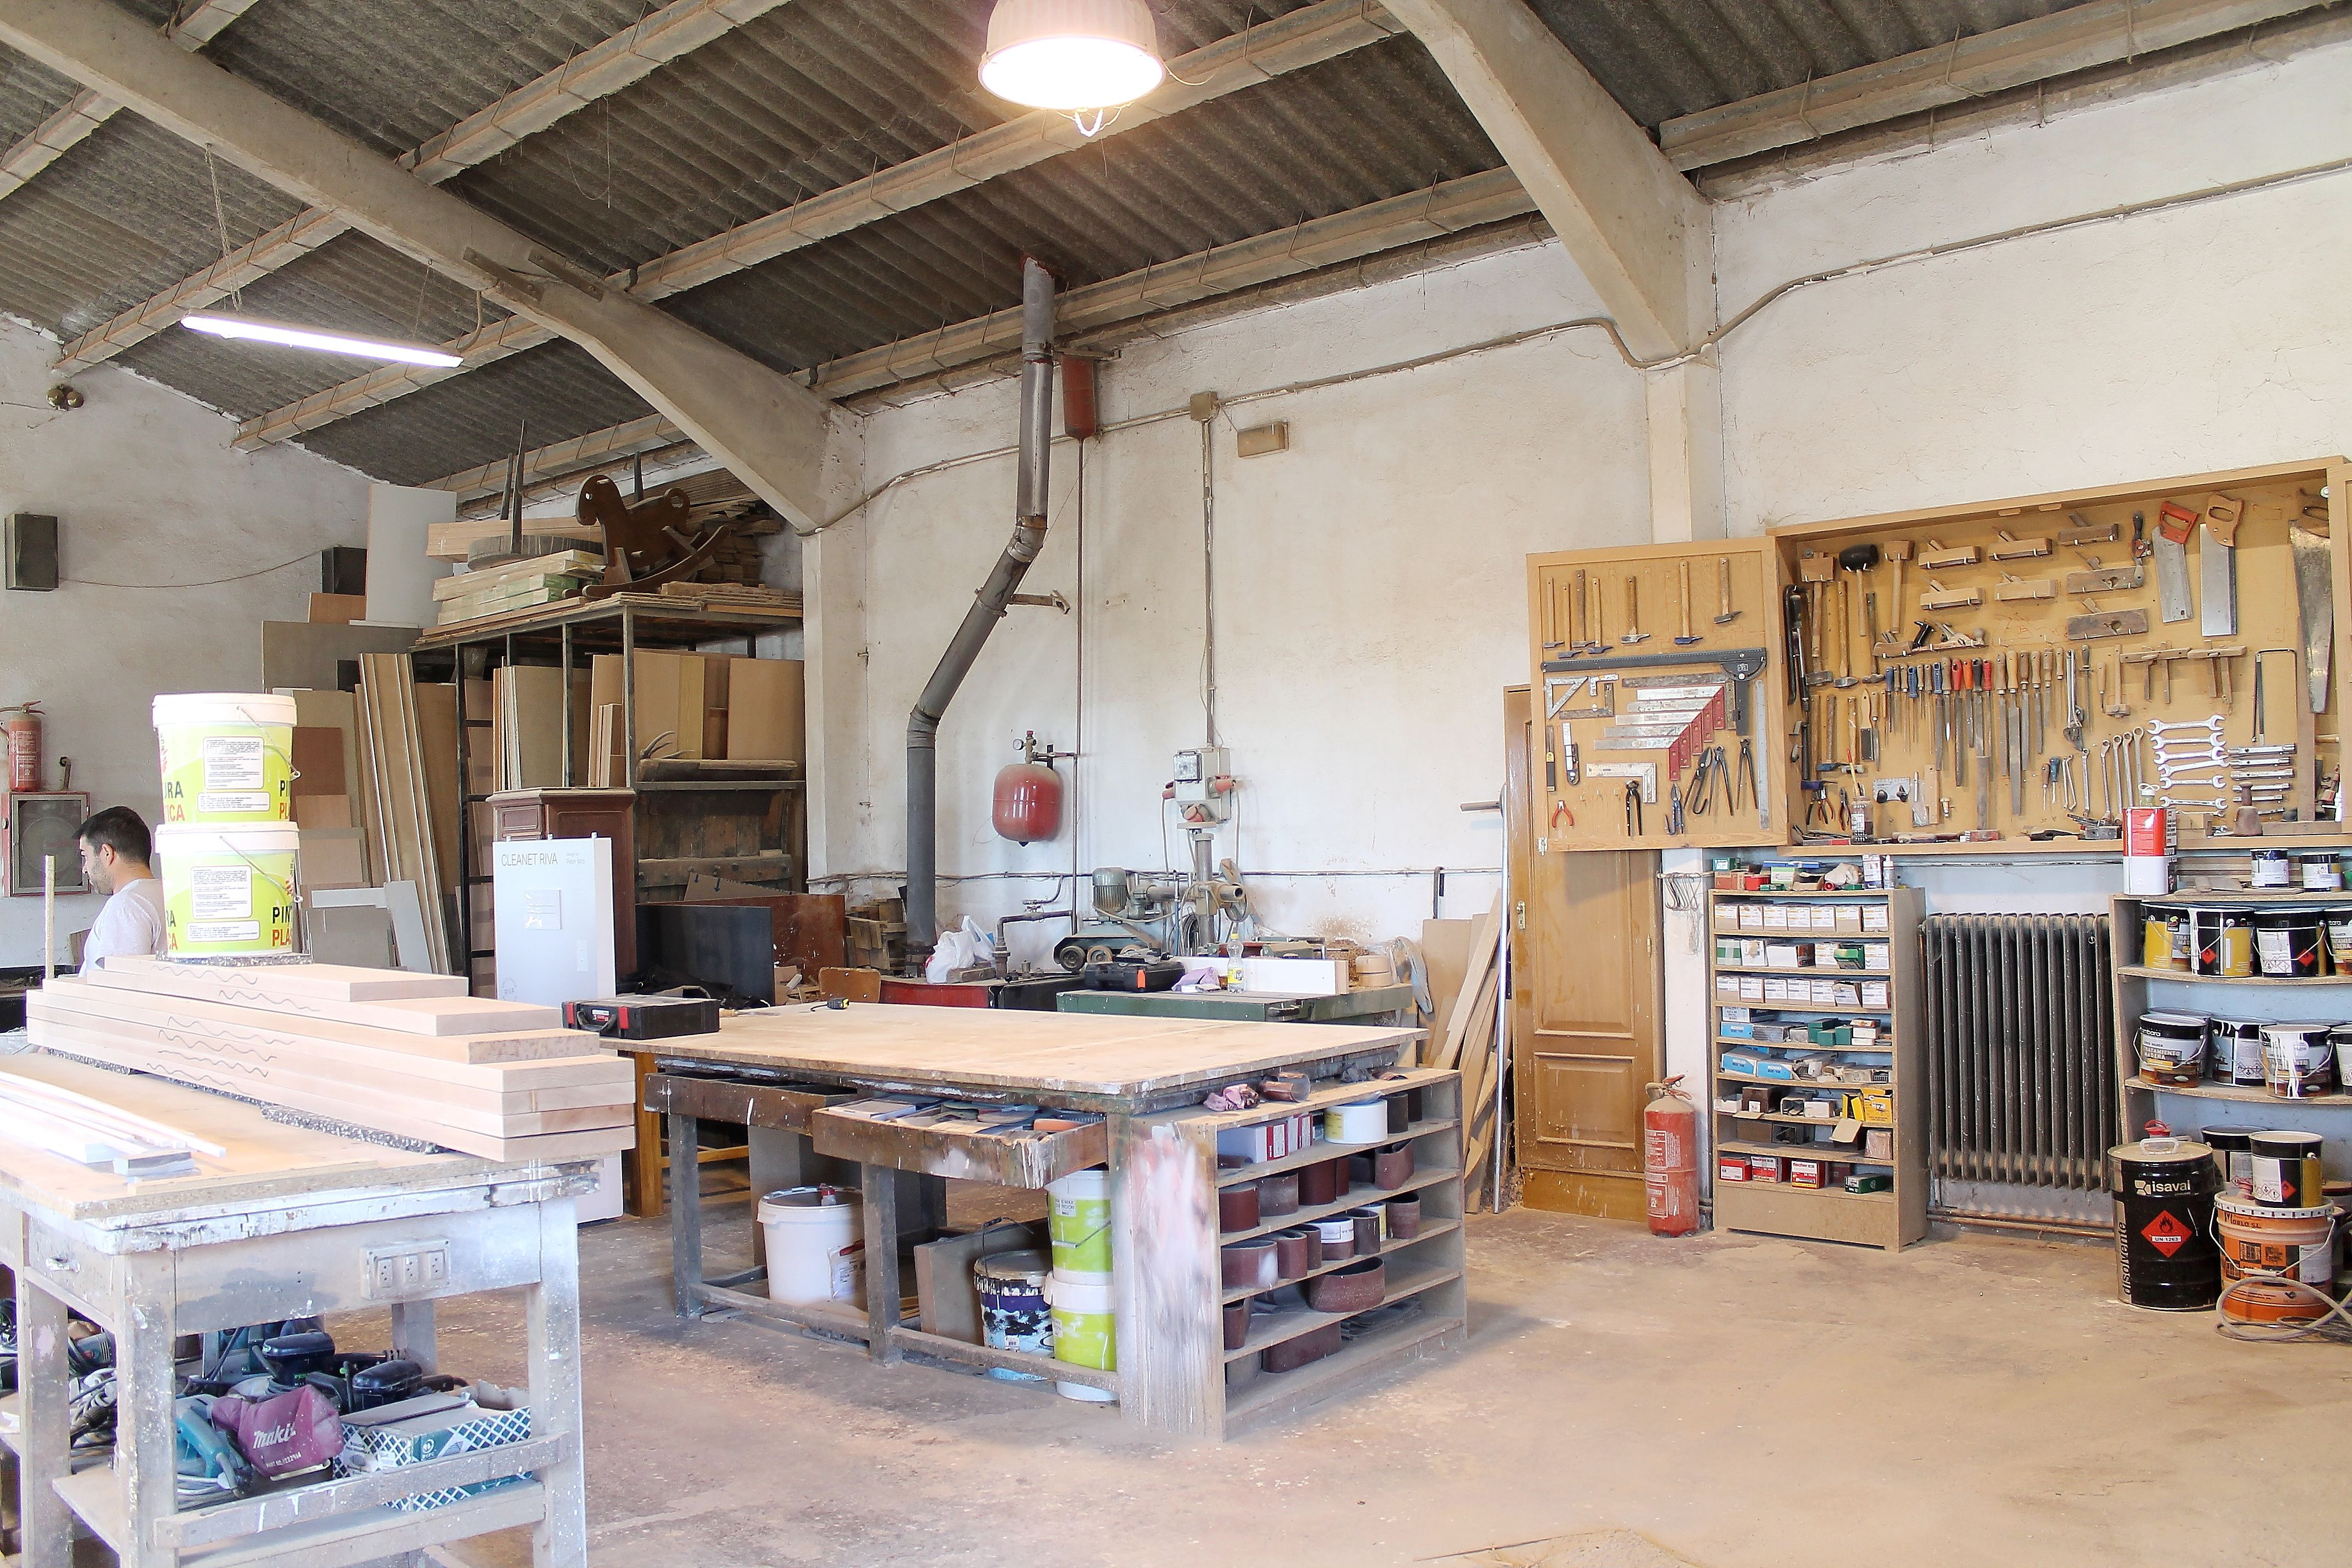 Carpintería artesana de madera en Pedrezuela